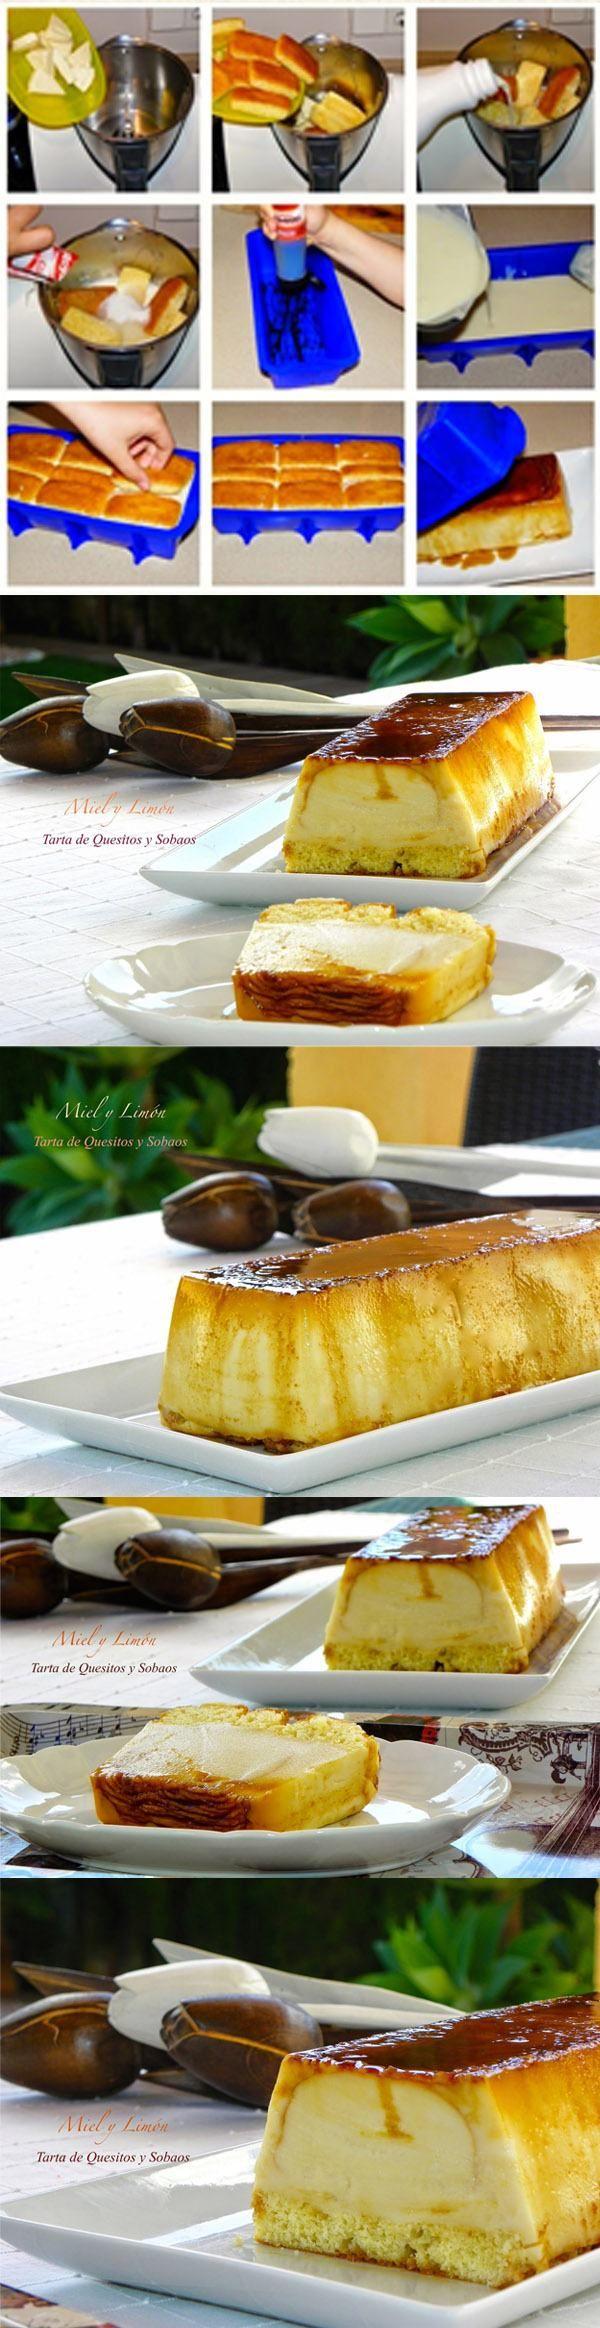 Tarta de quesitos y sobaos / http://mielylimonrecetas.blogspot.com.es/